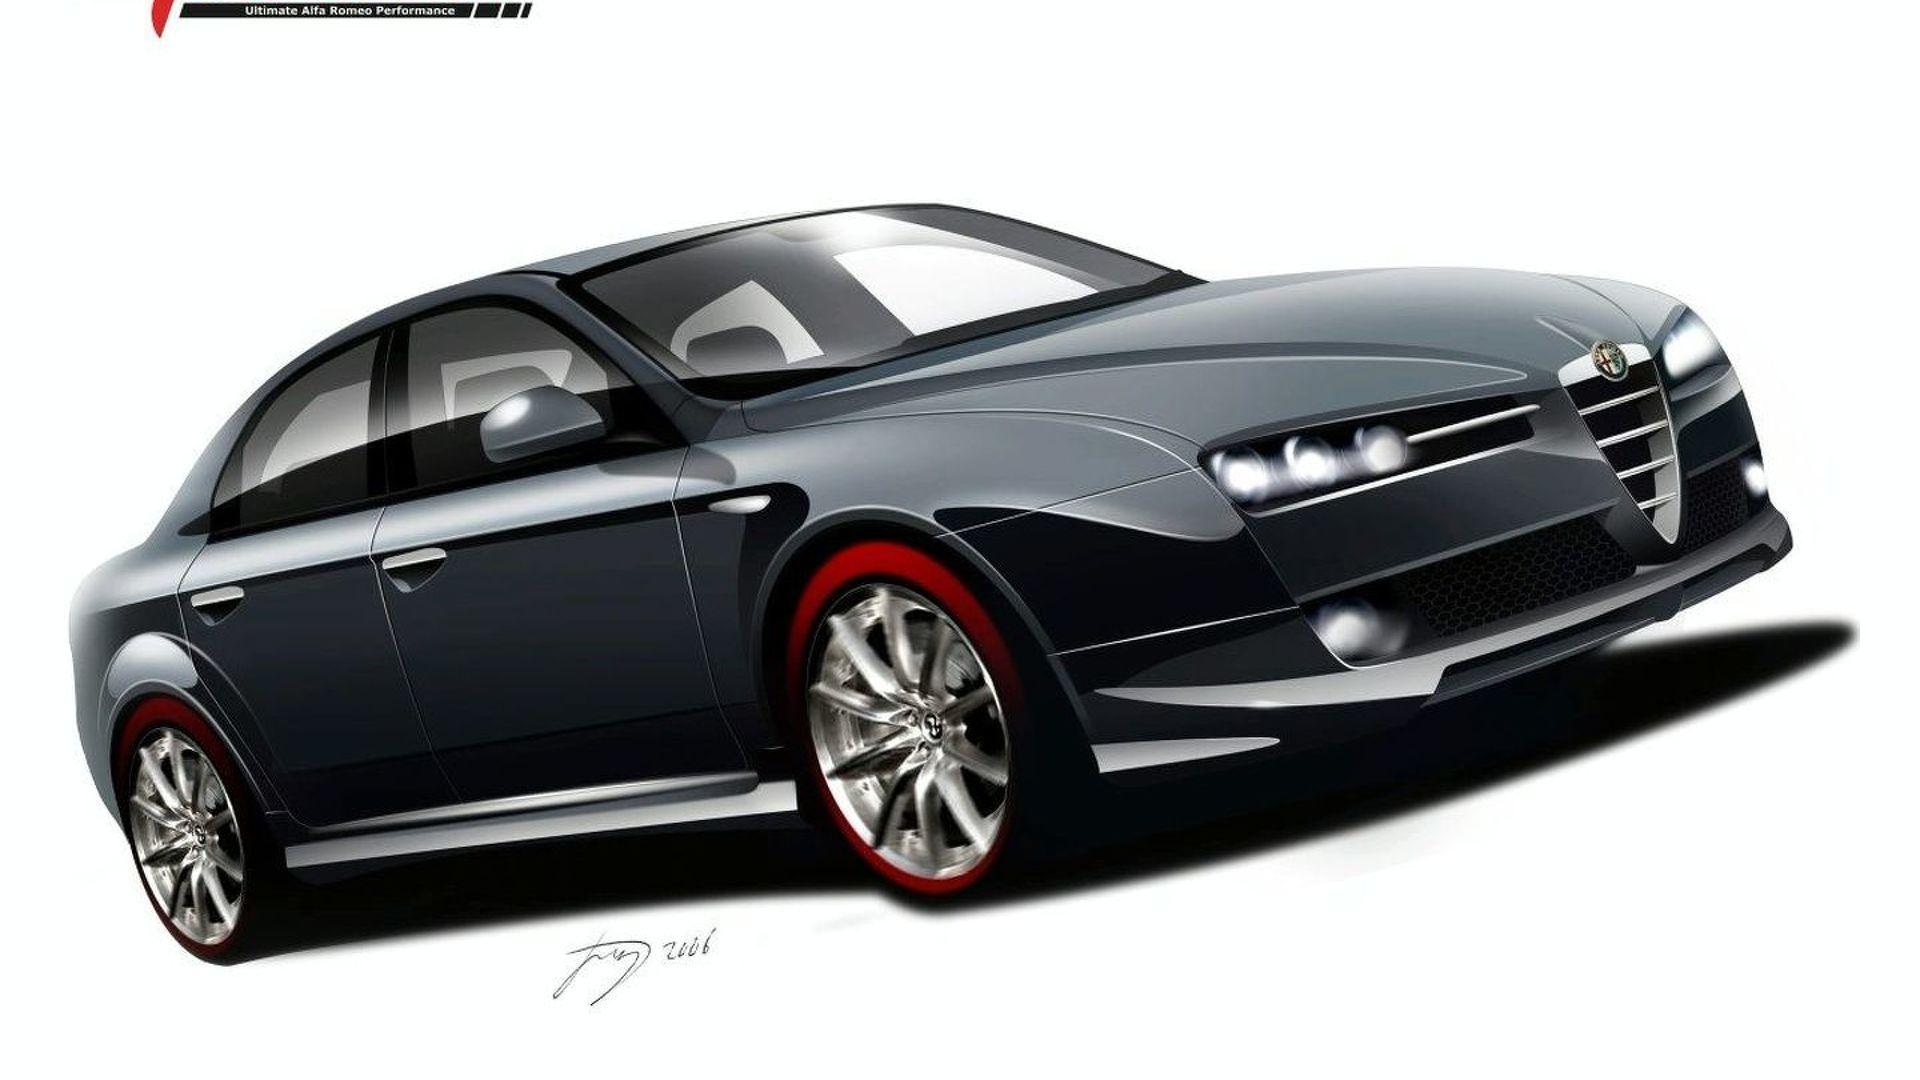 Autodelta 159 J4 2 2 Development Project